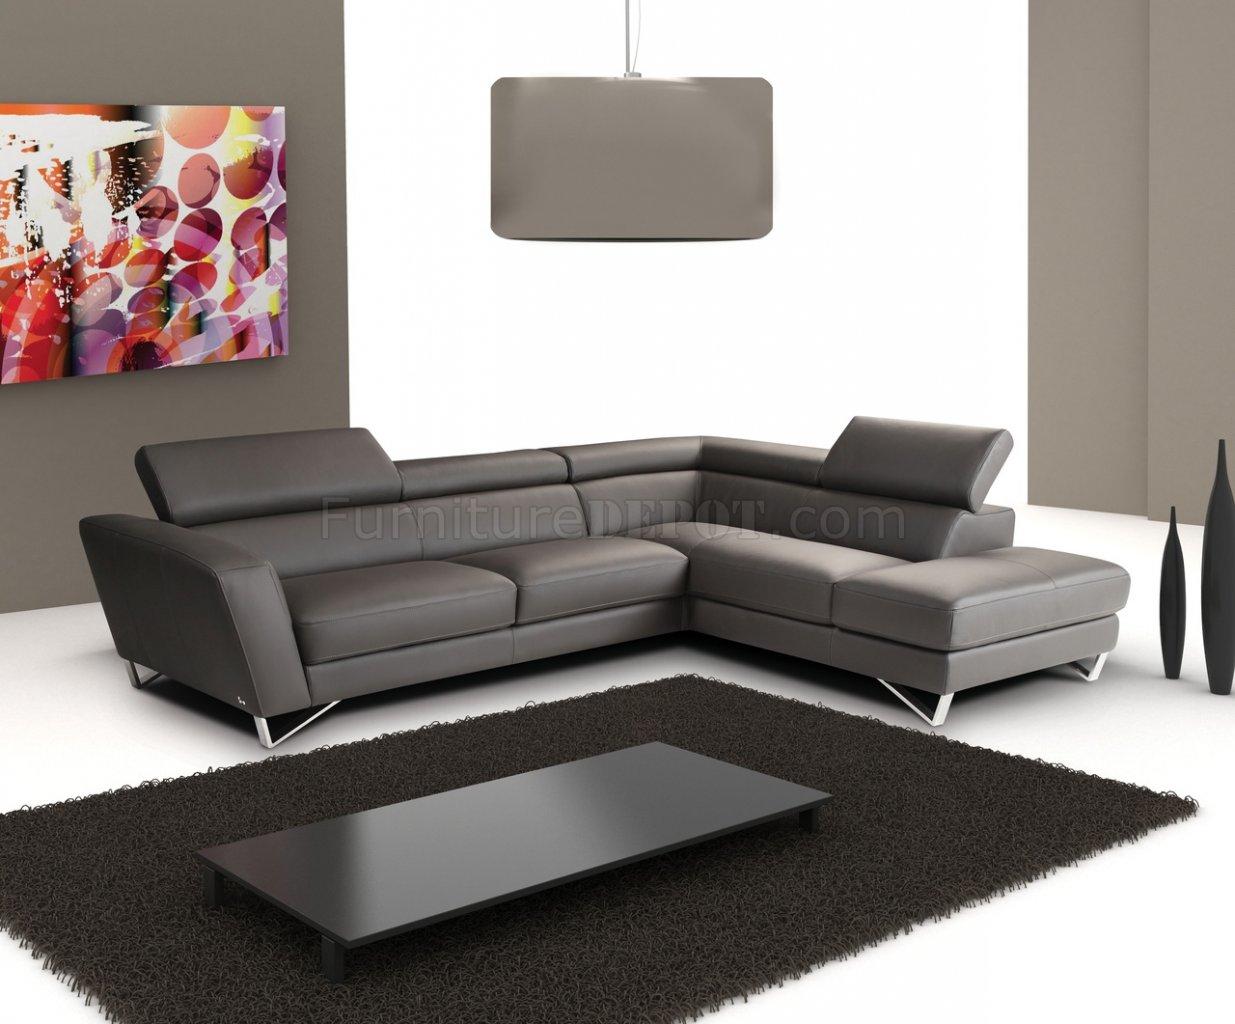 nicoletti lipari grey italian leather sofa chaise tosh furniture modern white sectional dark full w steel legs